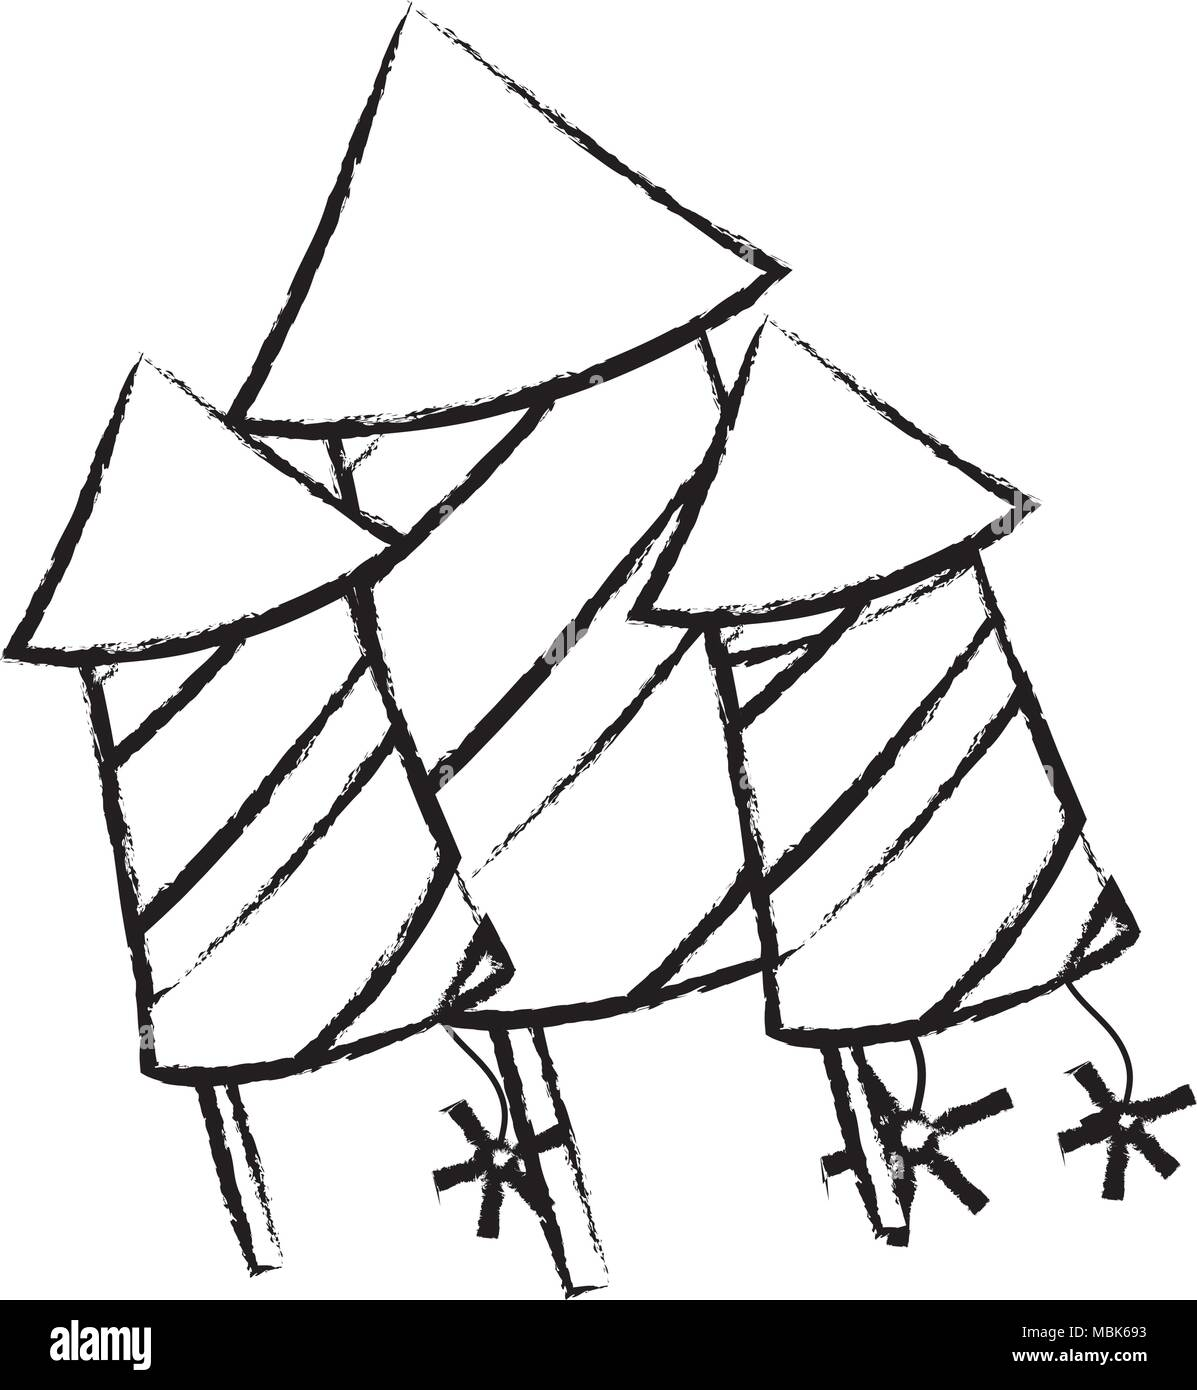 Sketch of rocket firework icon over white background vector illustration stock image